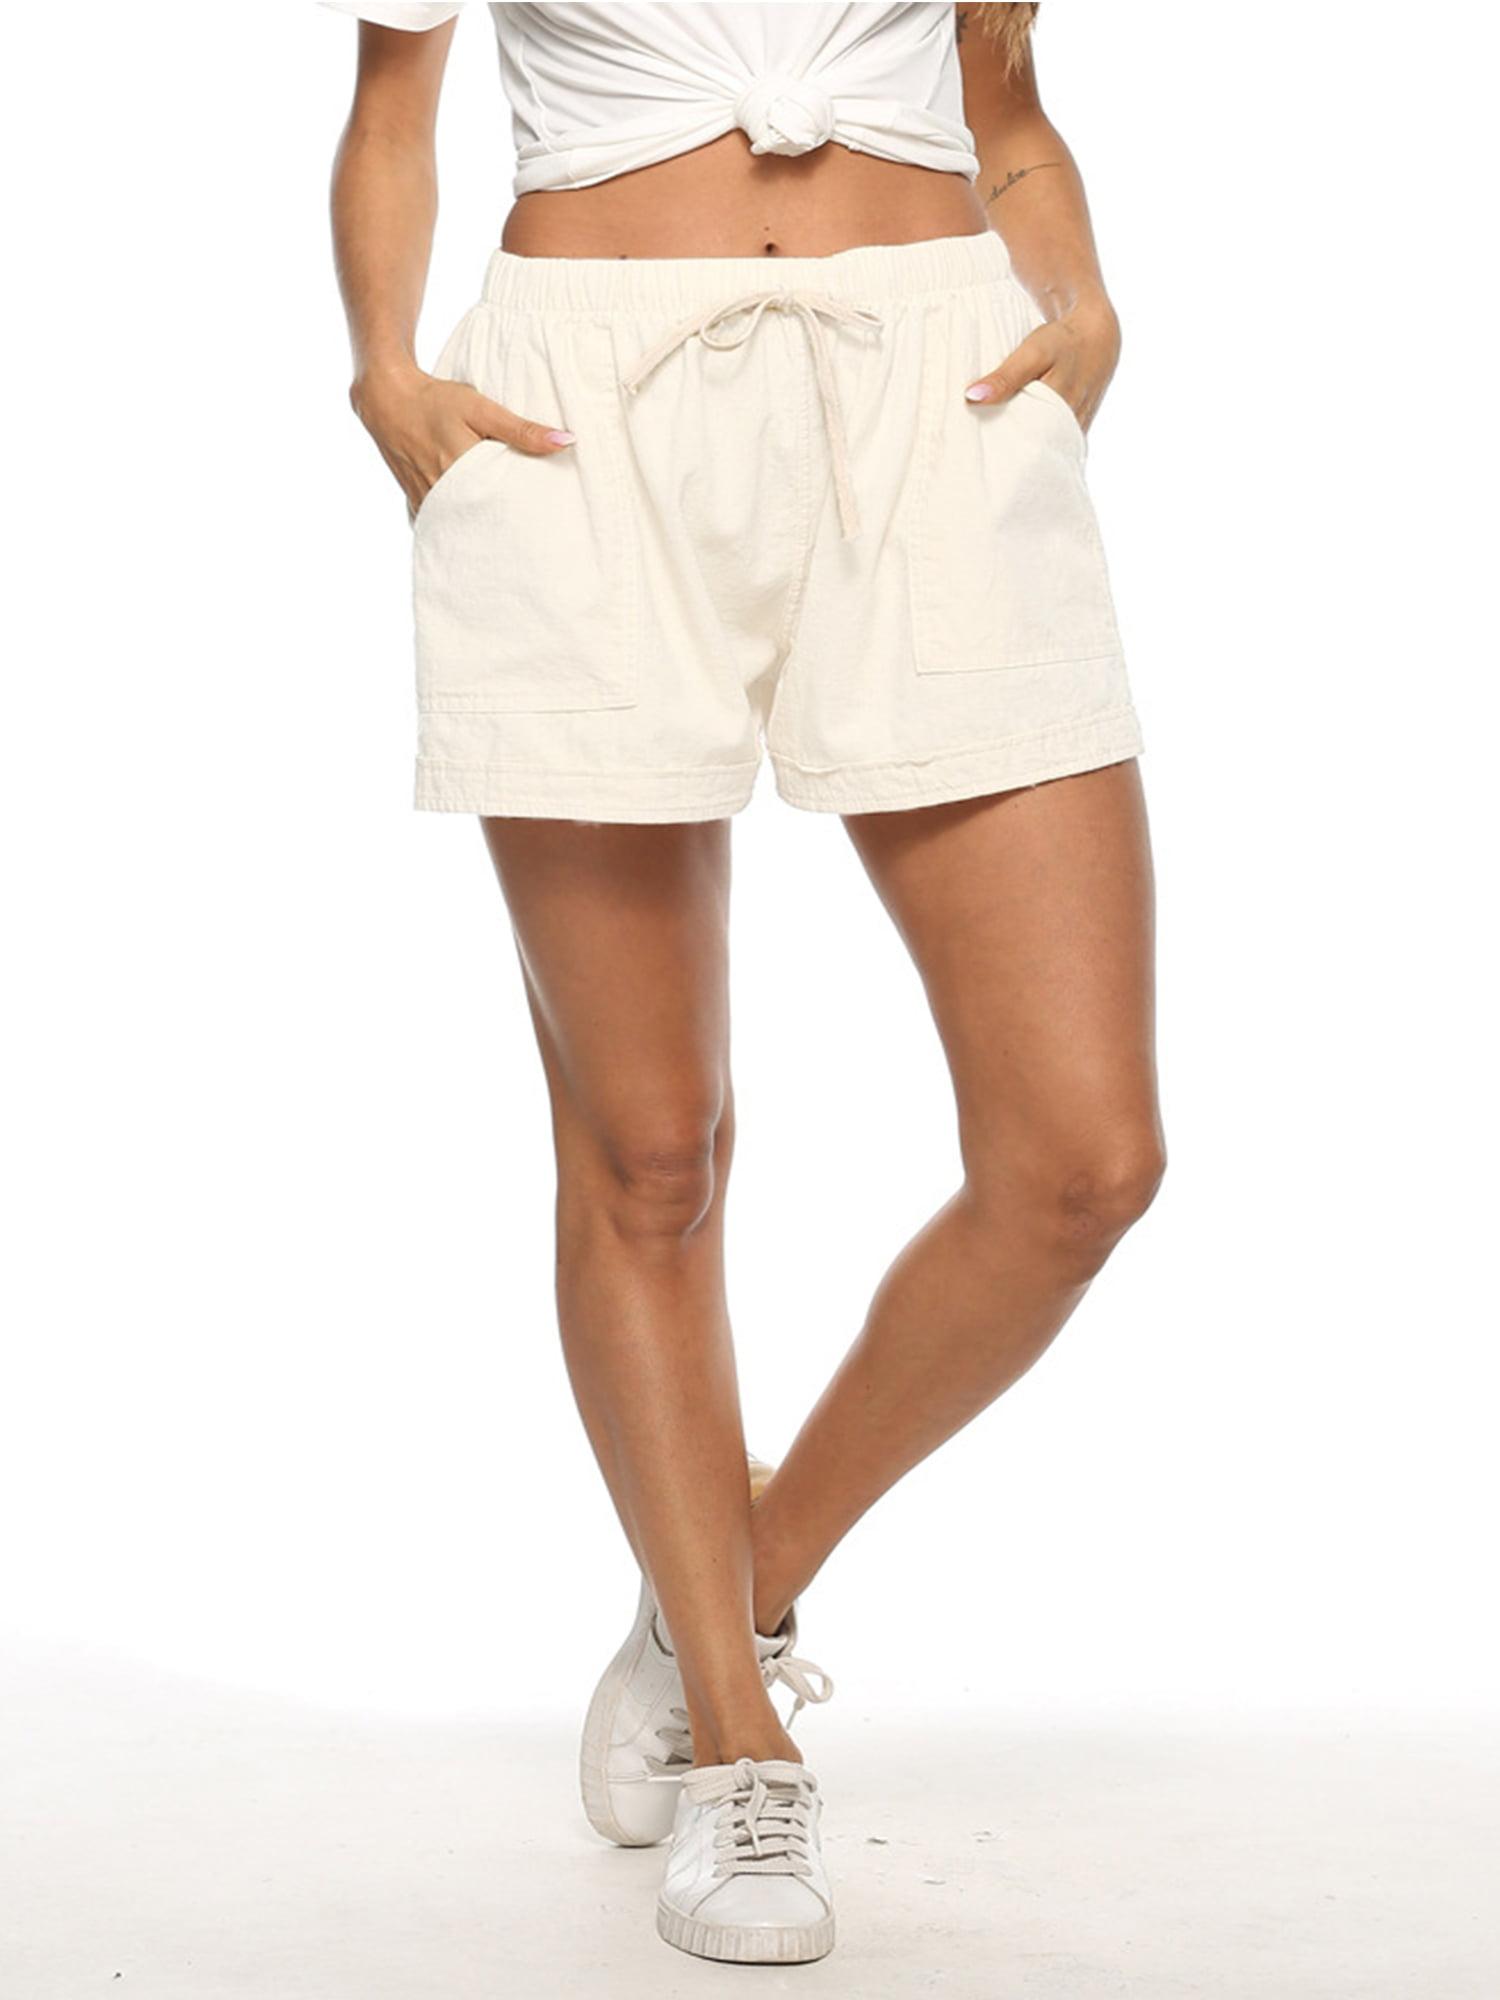 Womens Cotton+Linen Baggy Shorts Ladies Summer Elastic Waist Beach Casual Pants